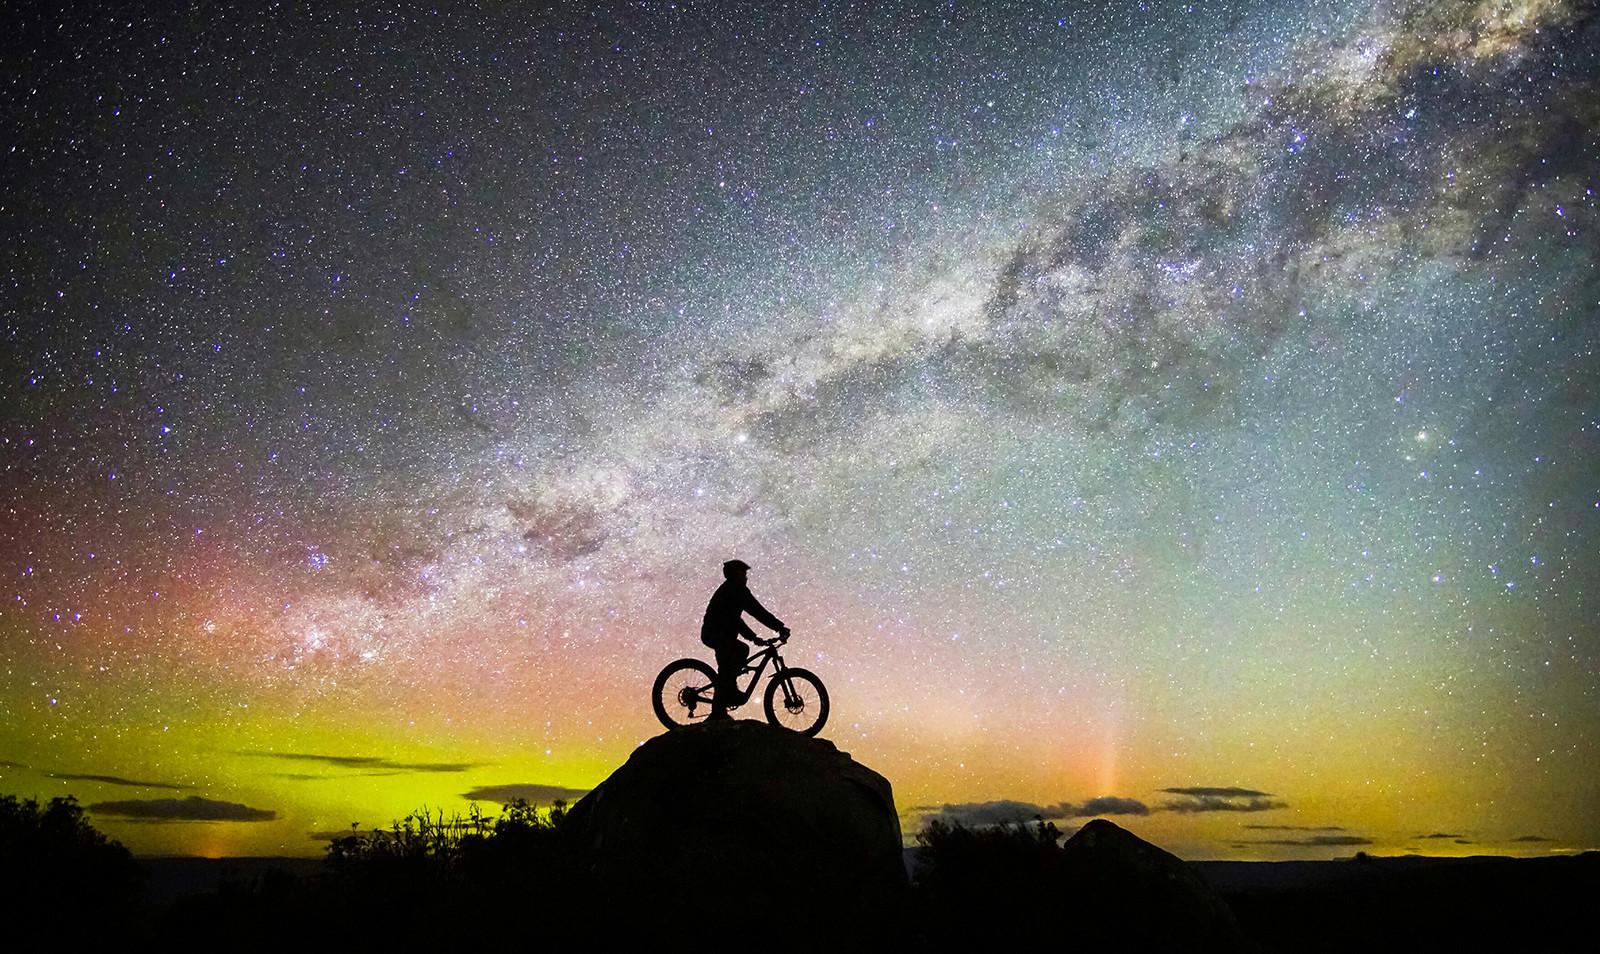 Southern Lights - digitalhippie - Mountain Biking Pictures - Vital MTB